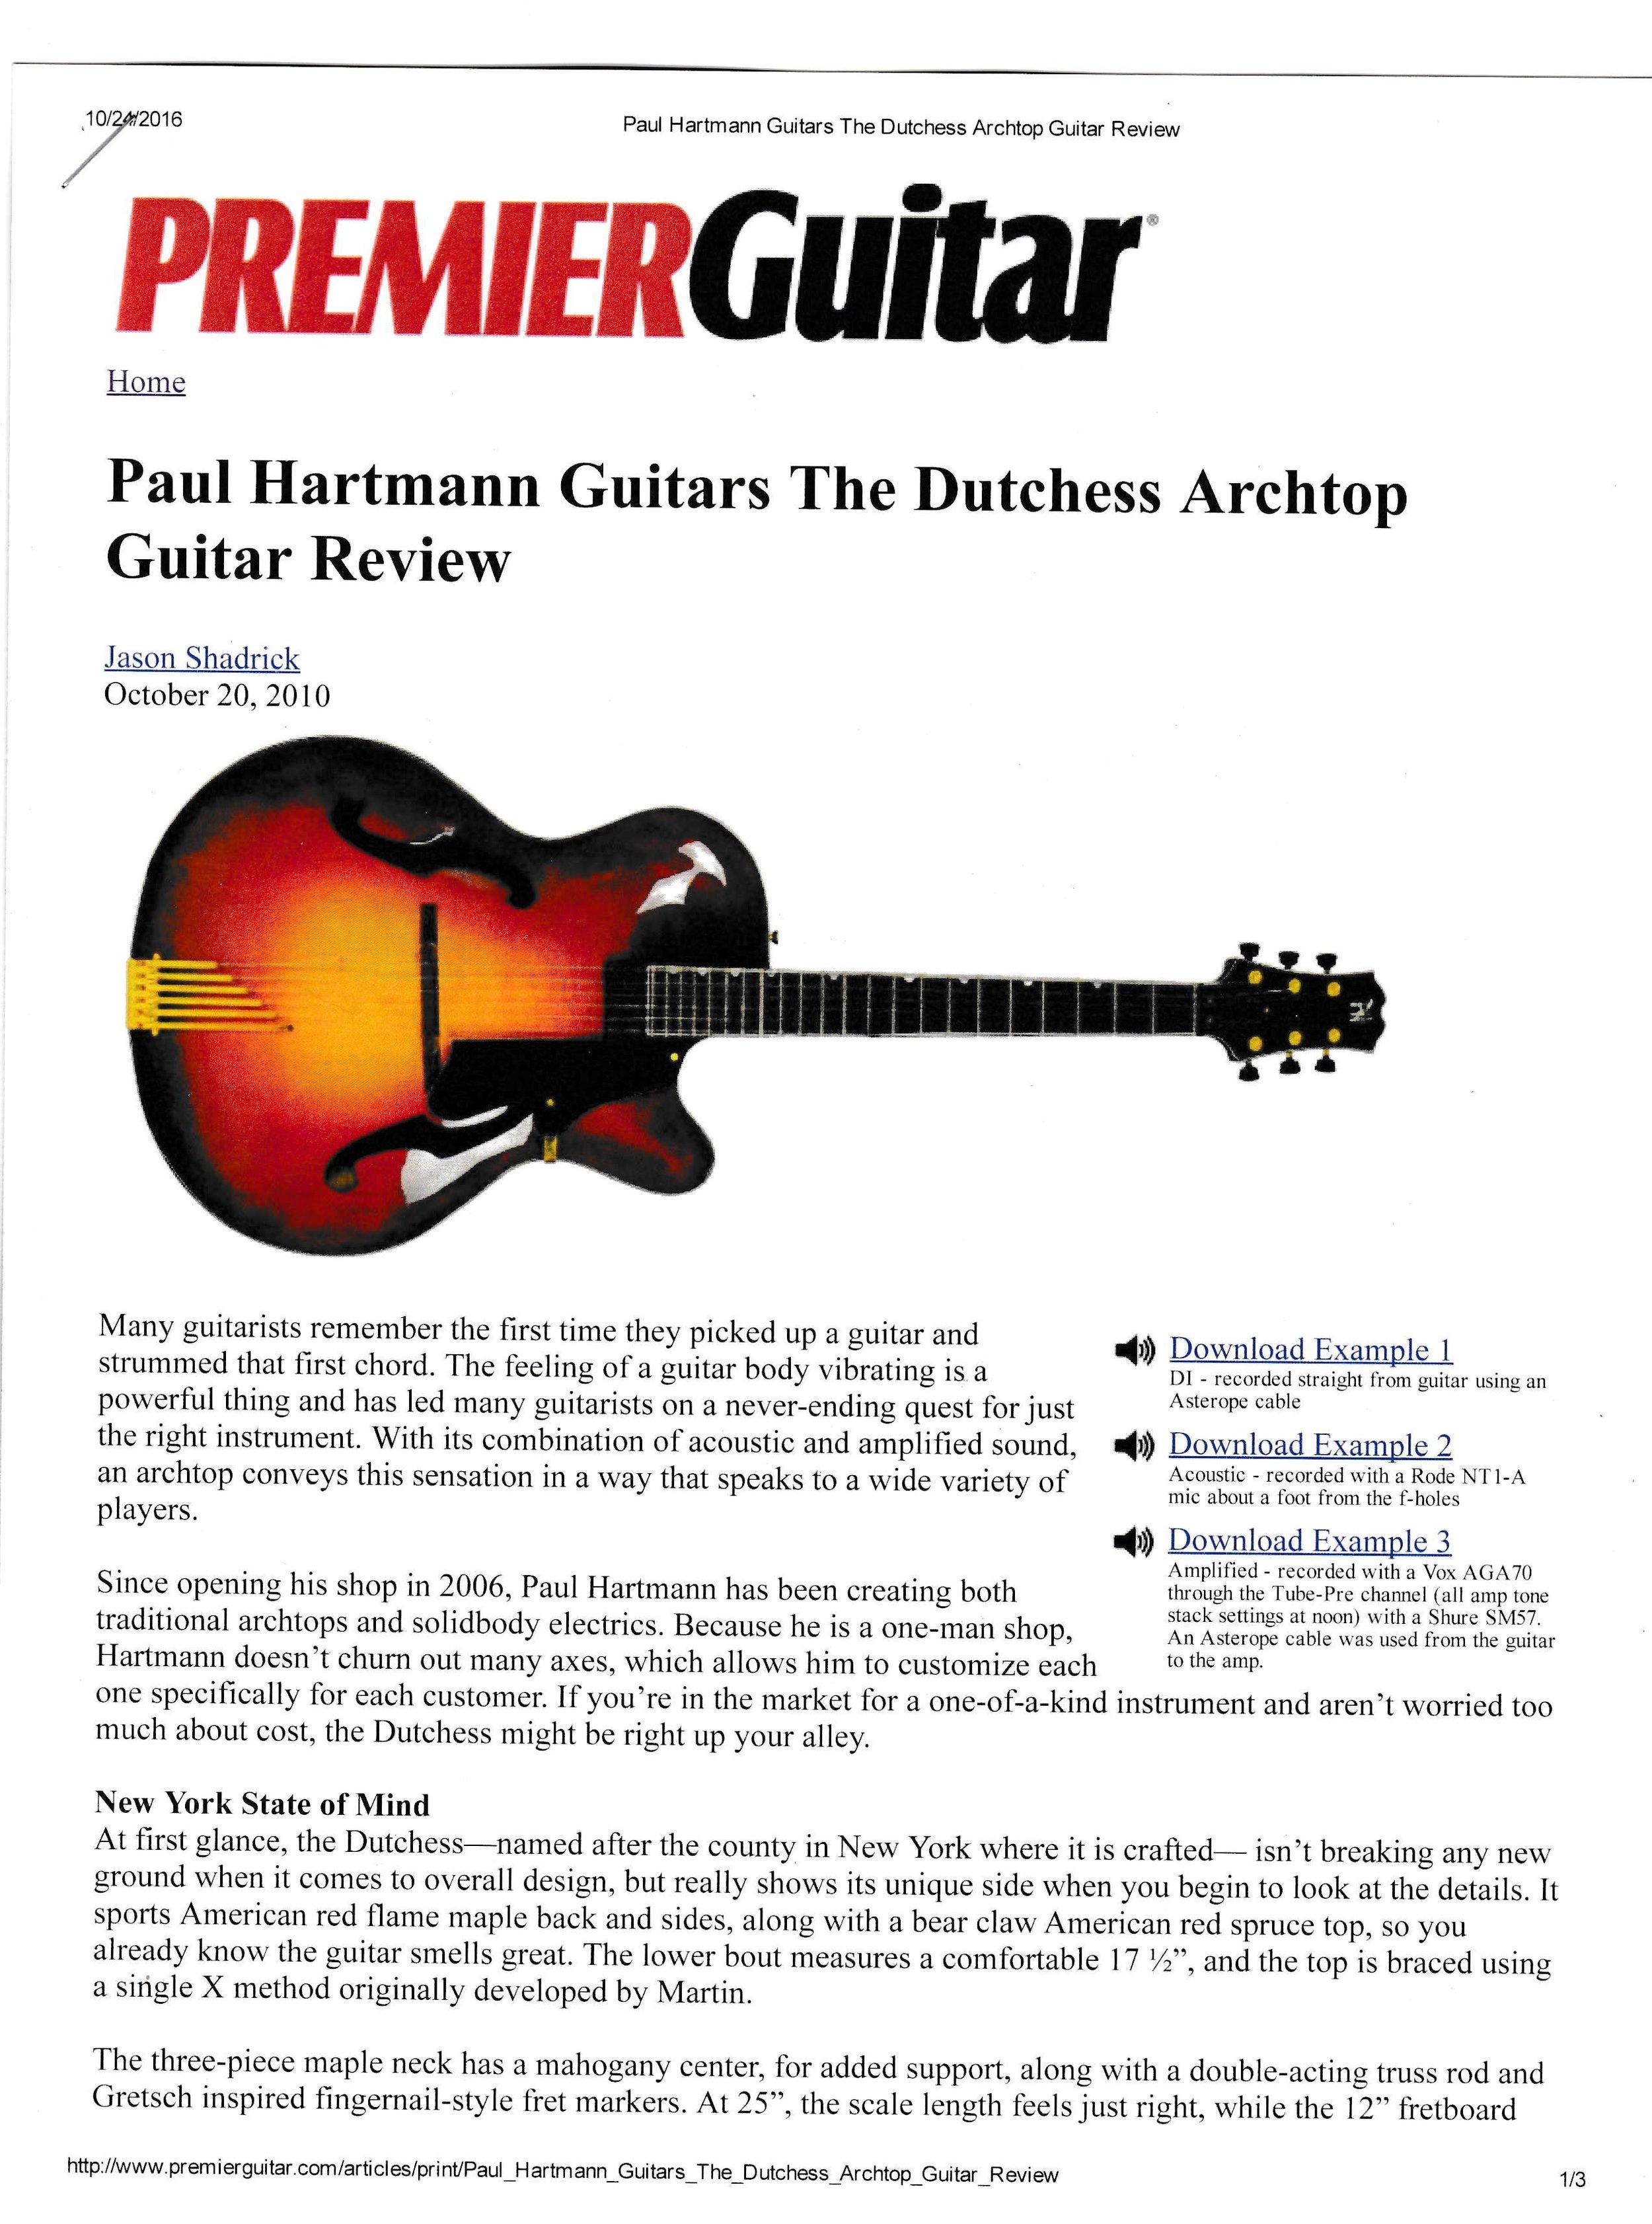 Premier Guitar December 2010